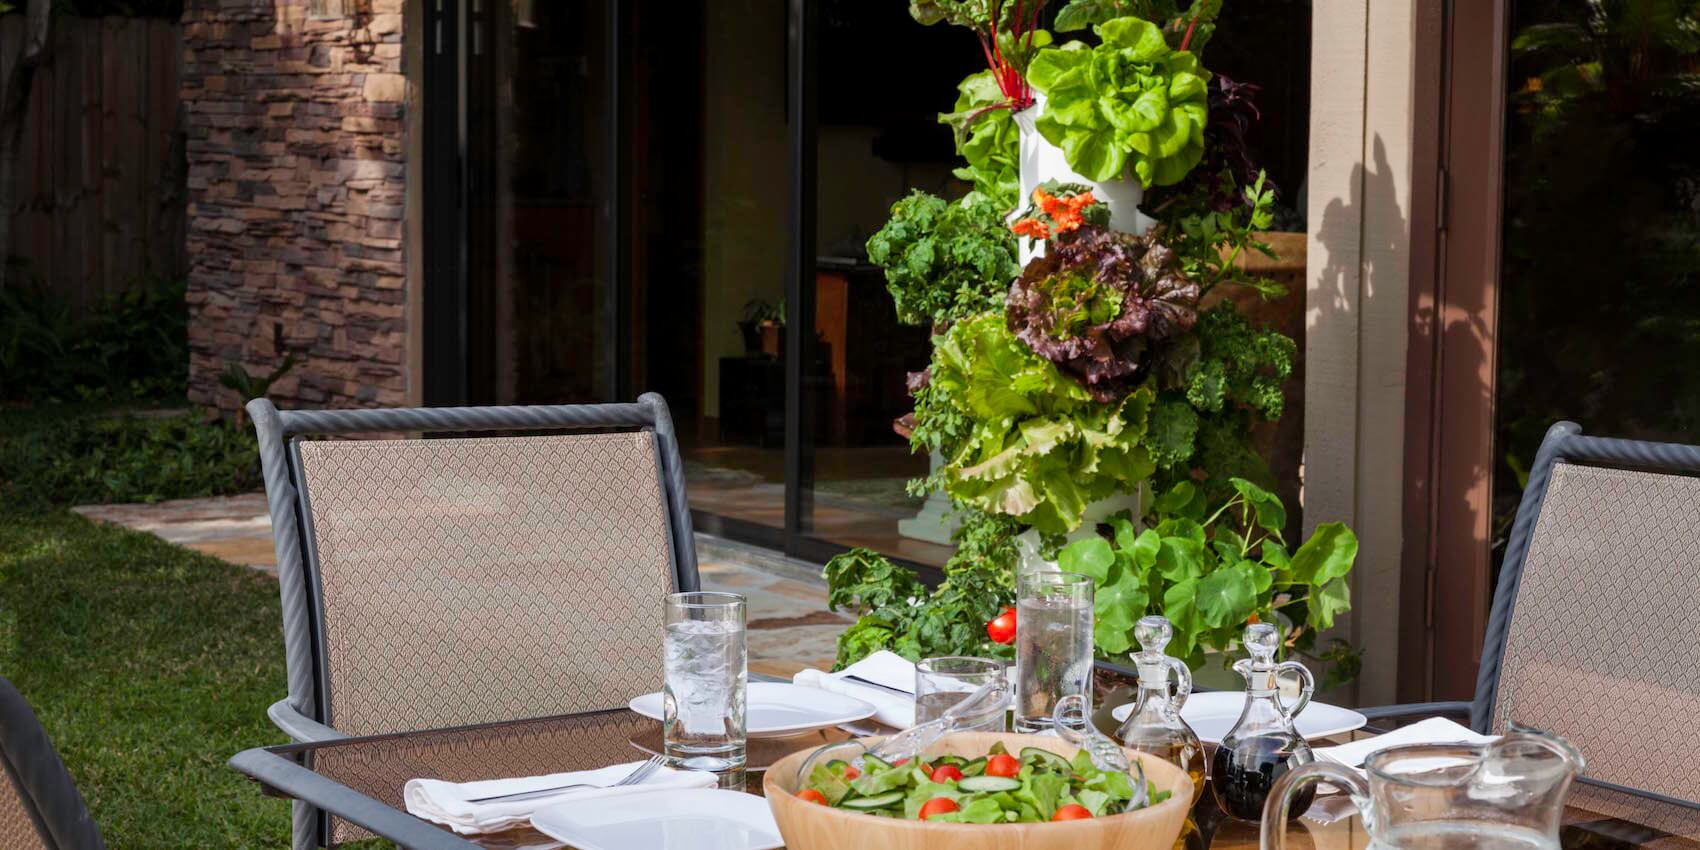 superfood-tower-garden.jpg